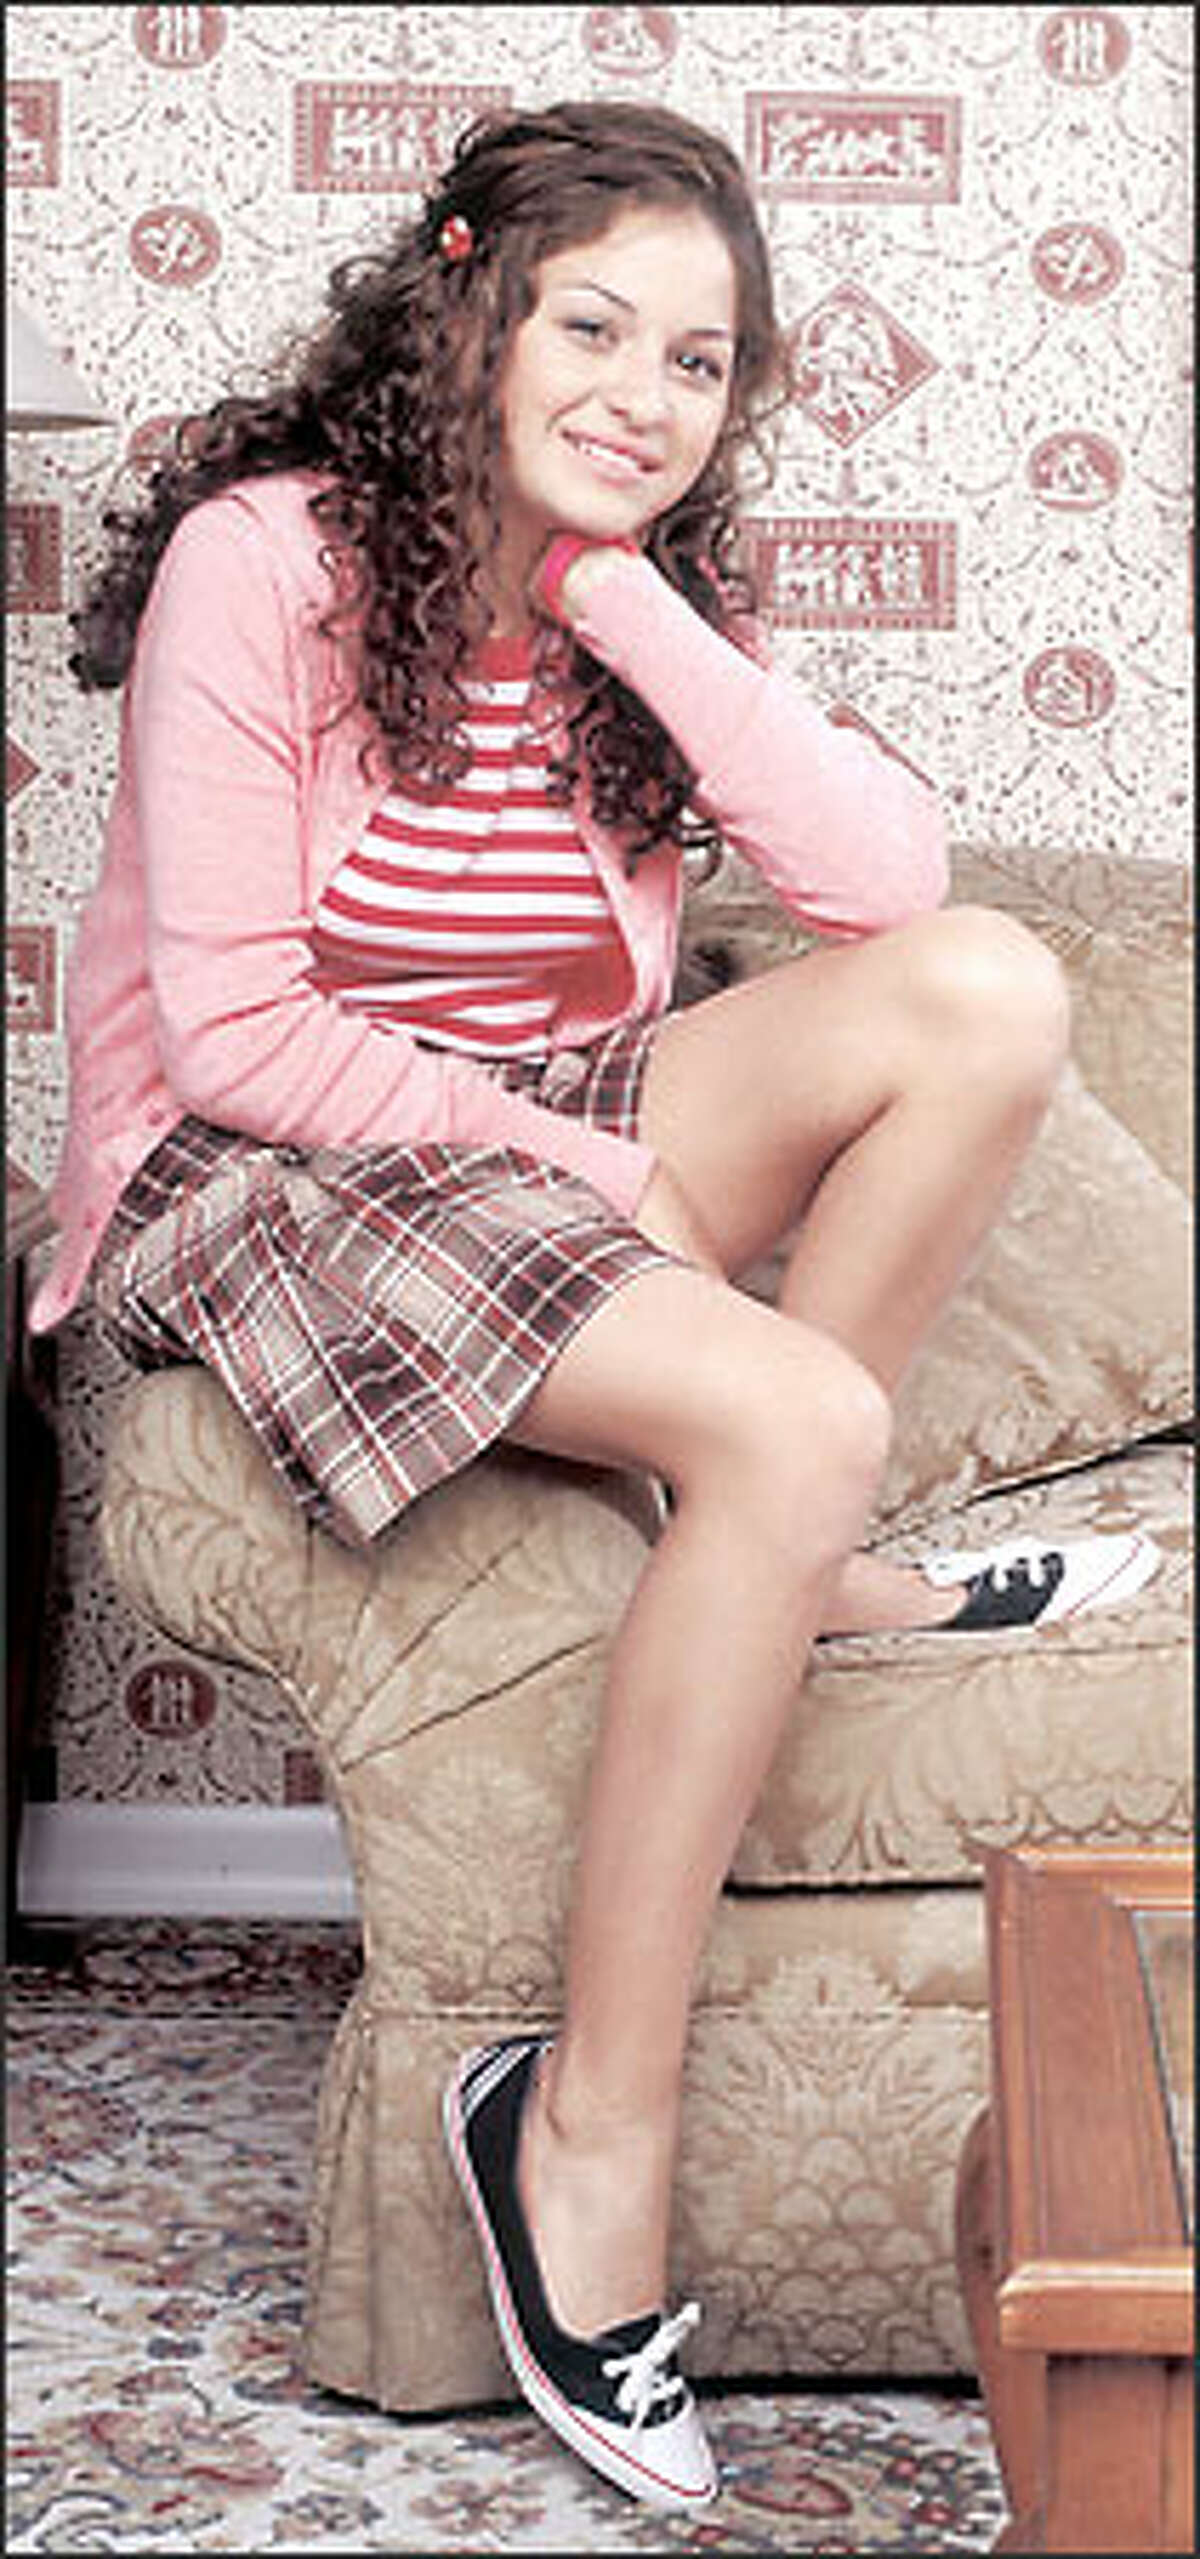 Alia Shawkat plays Maeby Fünke.